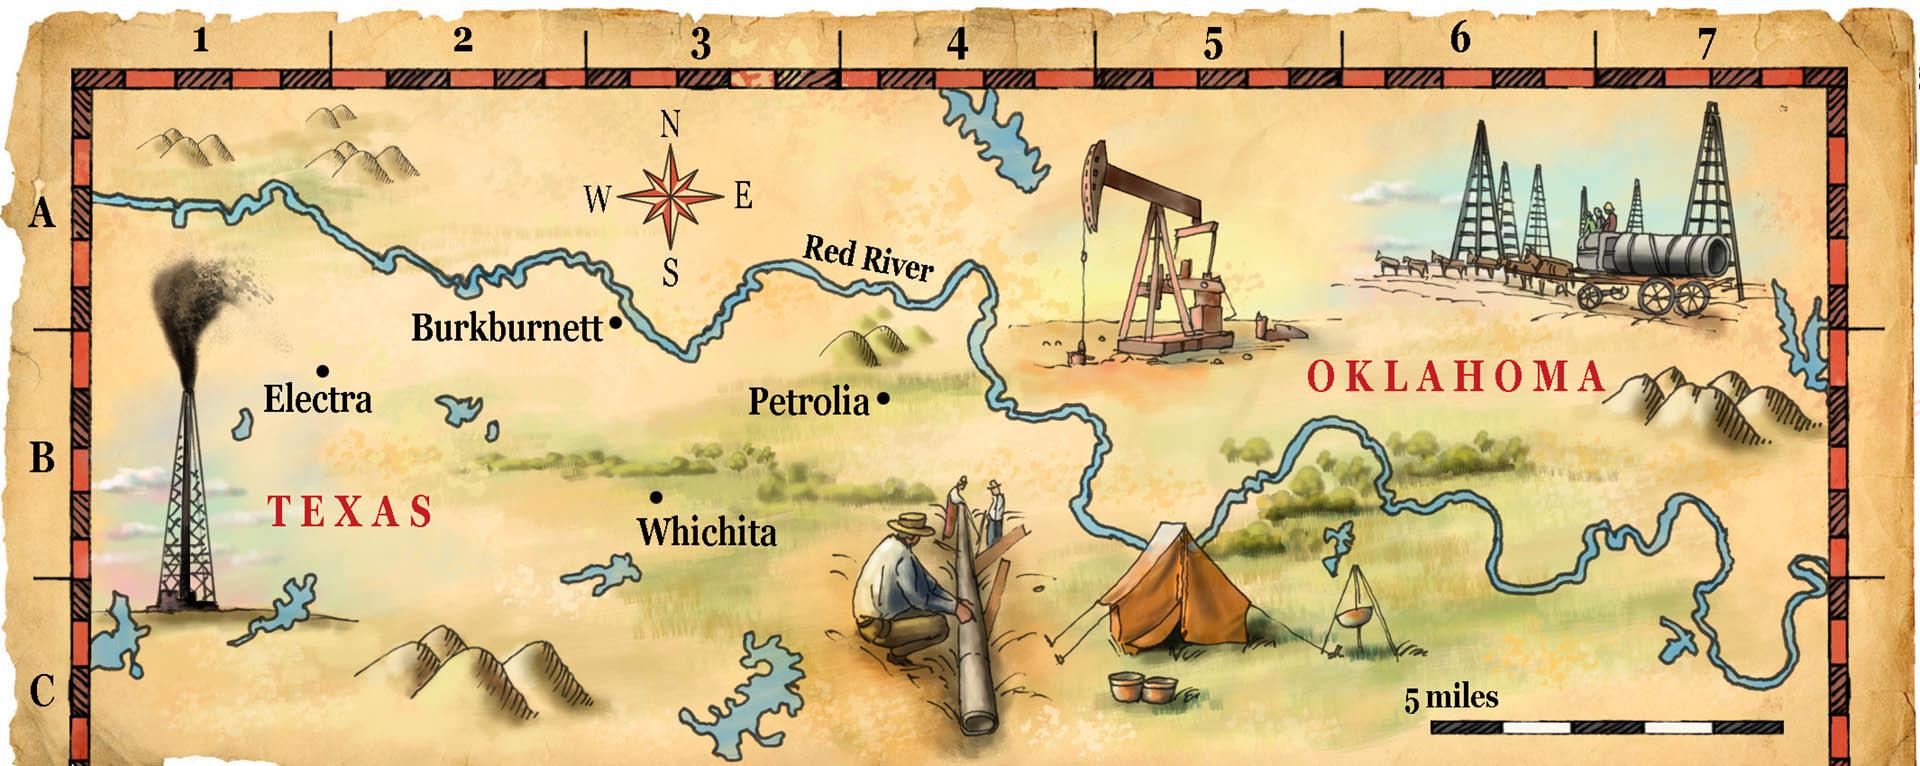 Texas Oil Map • Pearson USA